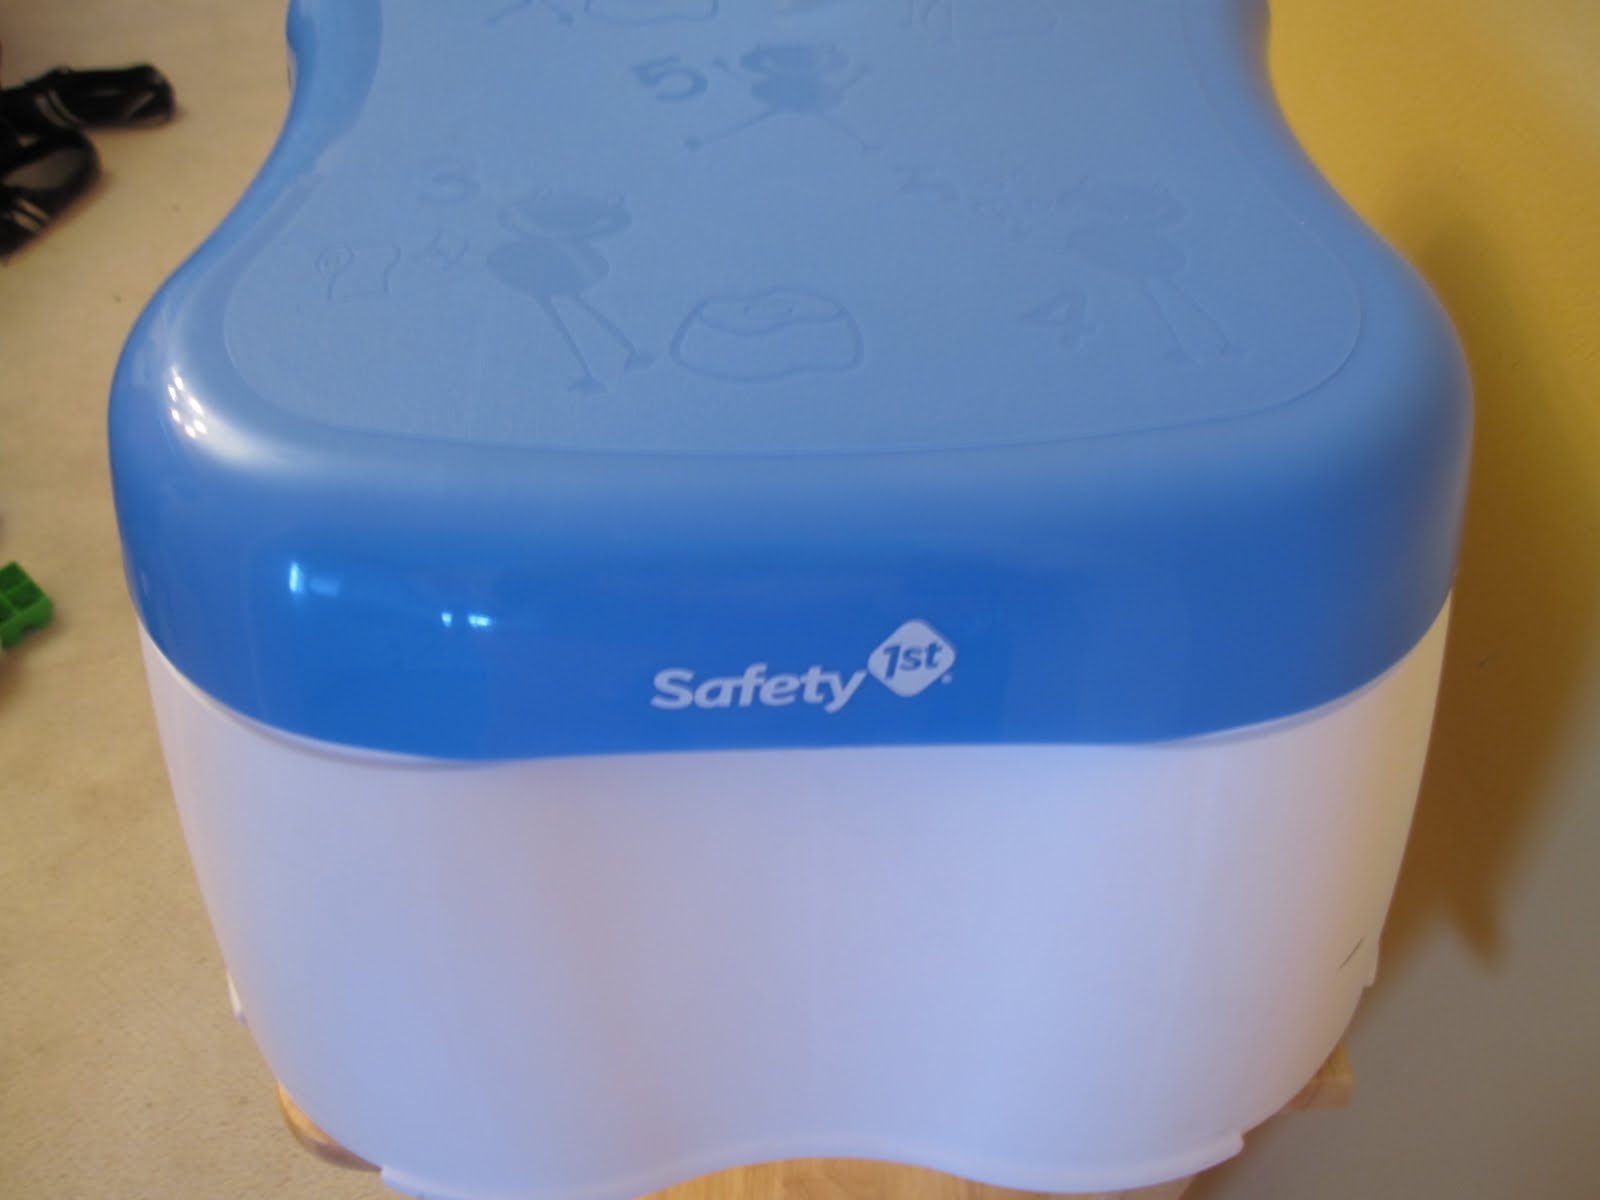 Safety 1st Potty Chair Best Beach For Seniors Presale Garage Sale Item 9 6 00 First Kids